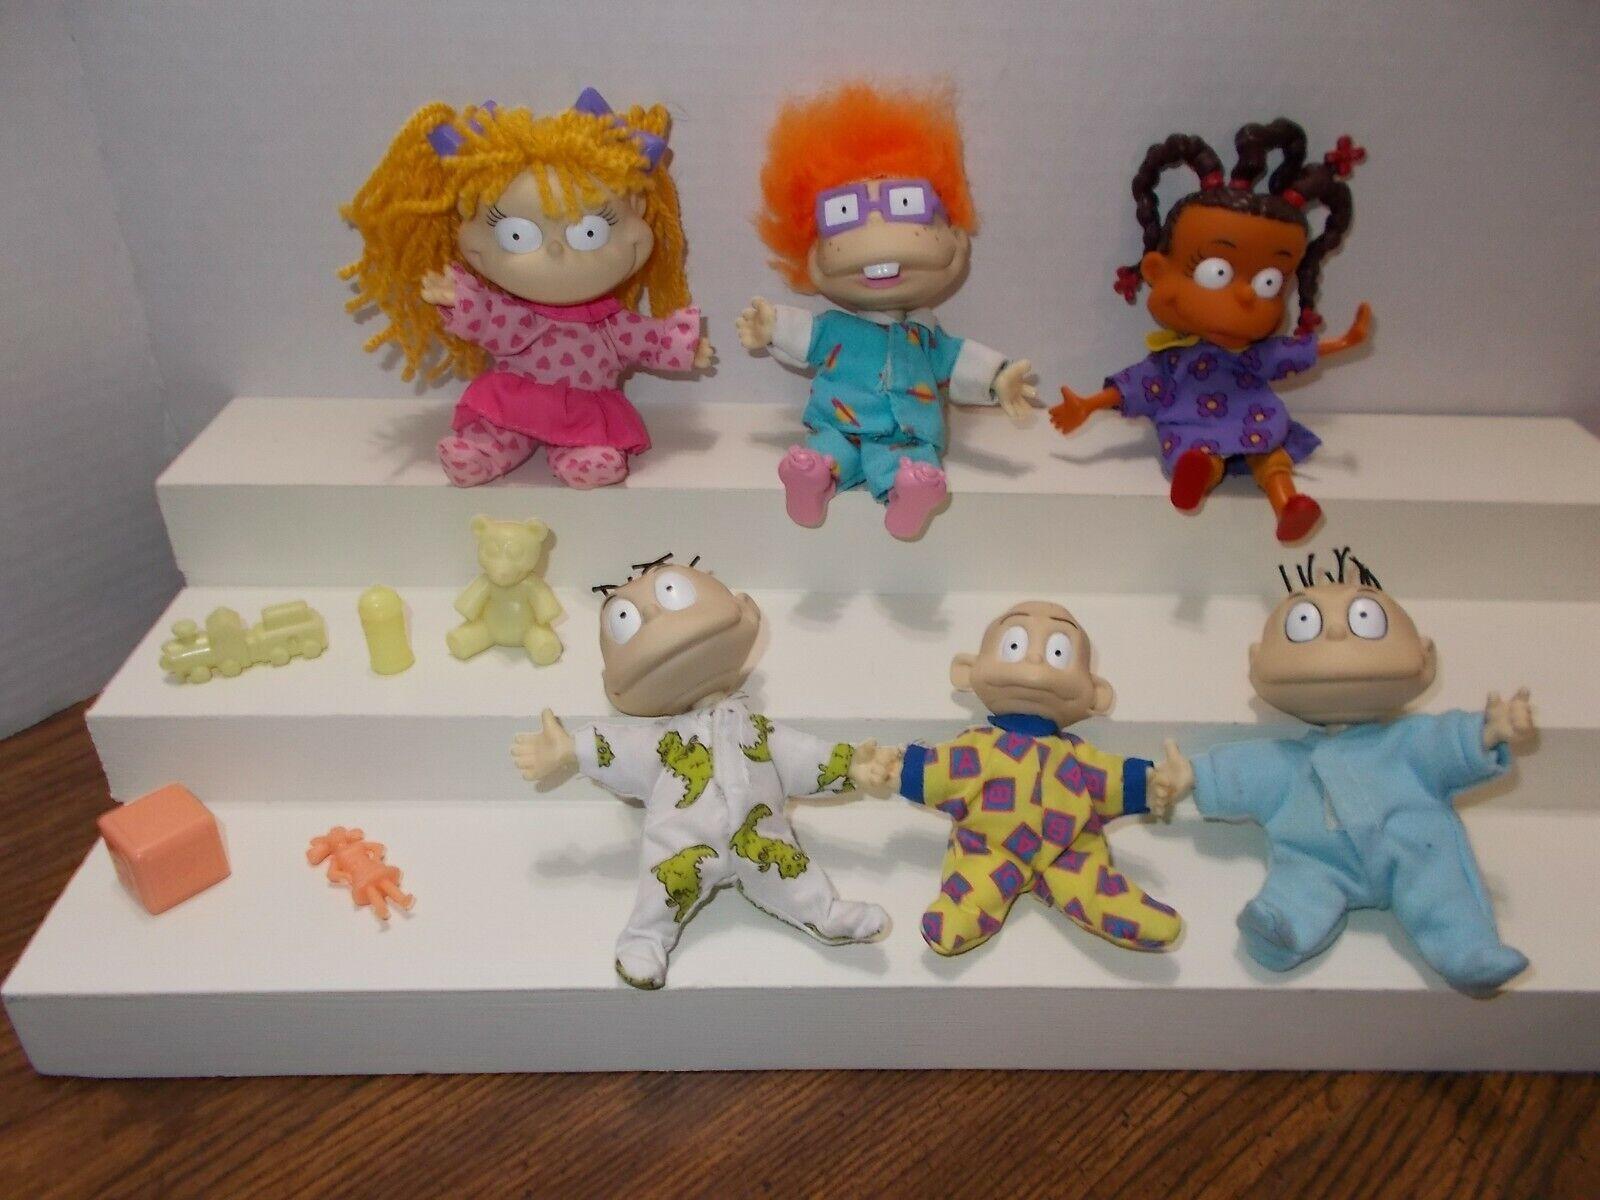 Vintage Lot Rugrats Small Plush Dolls & Accessories Viacom Nickelodeon 1997